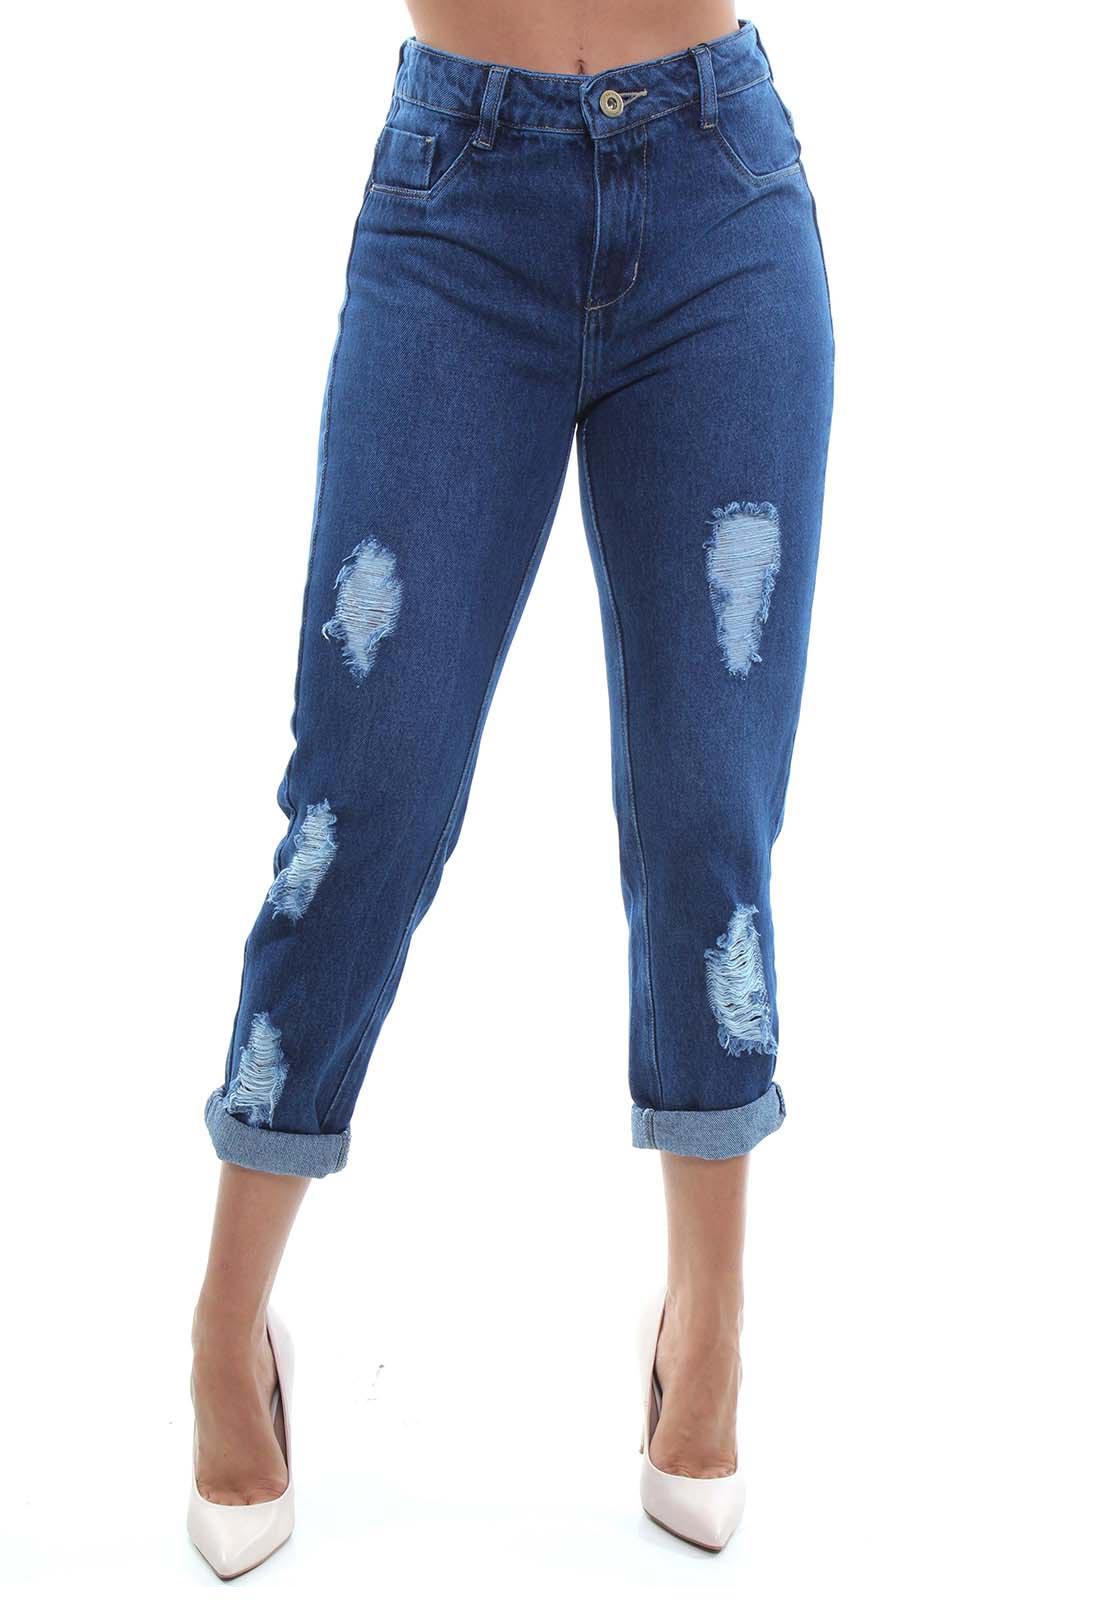 Calça Mom Fit Jeans Feminina Crocker - 48043  - CROCKER JEANS